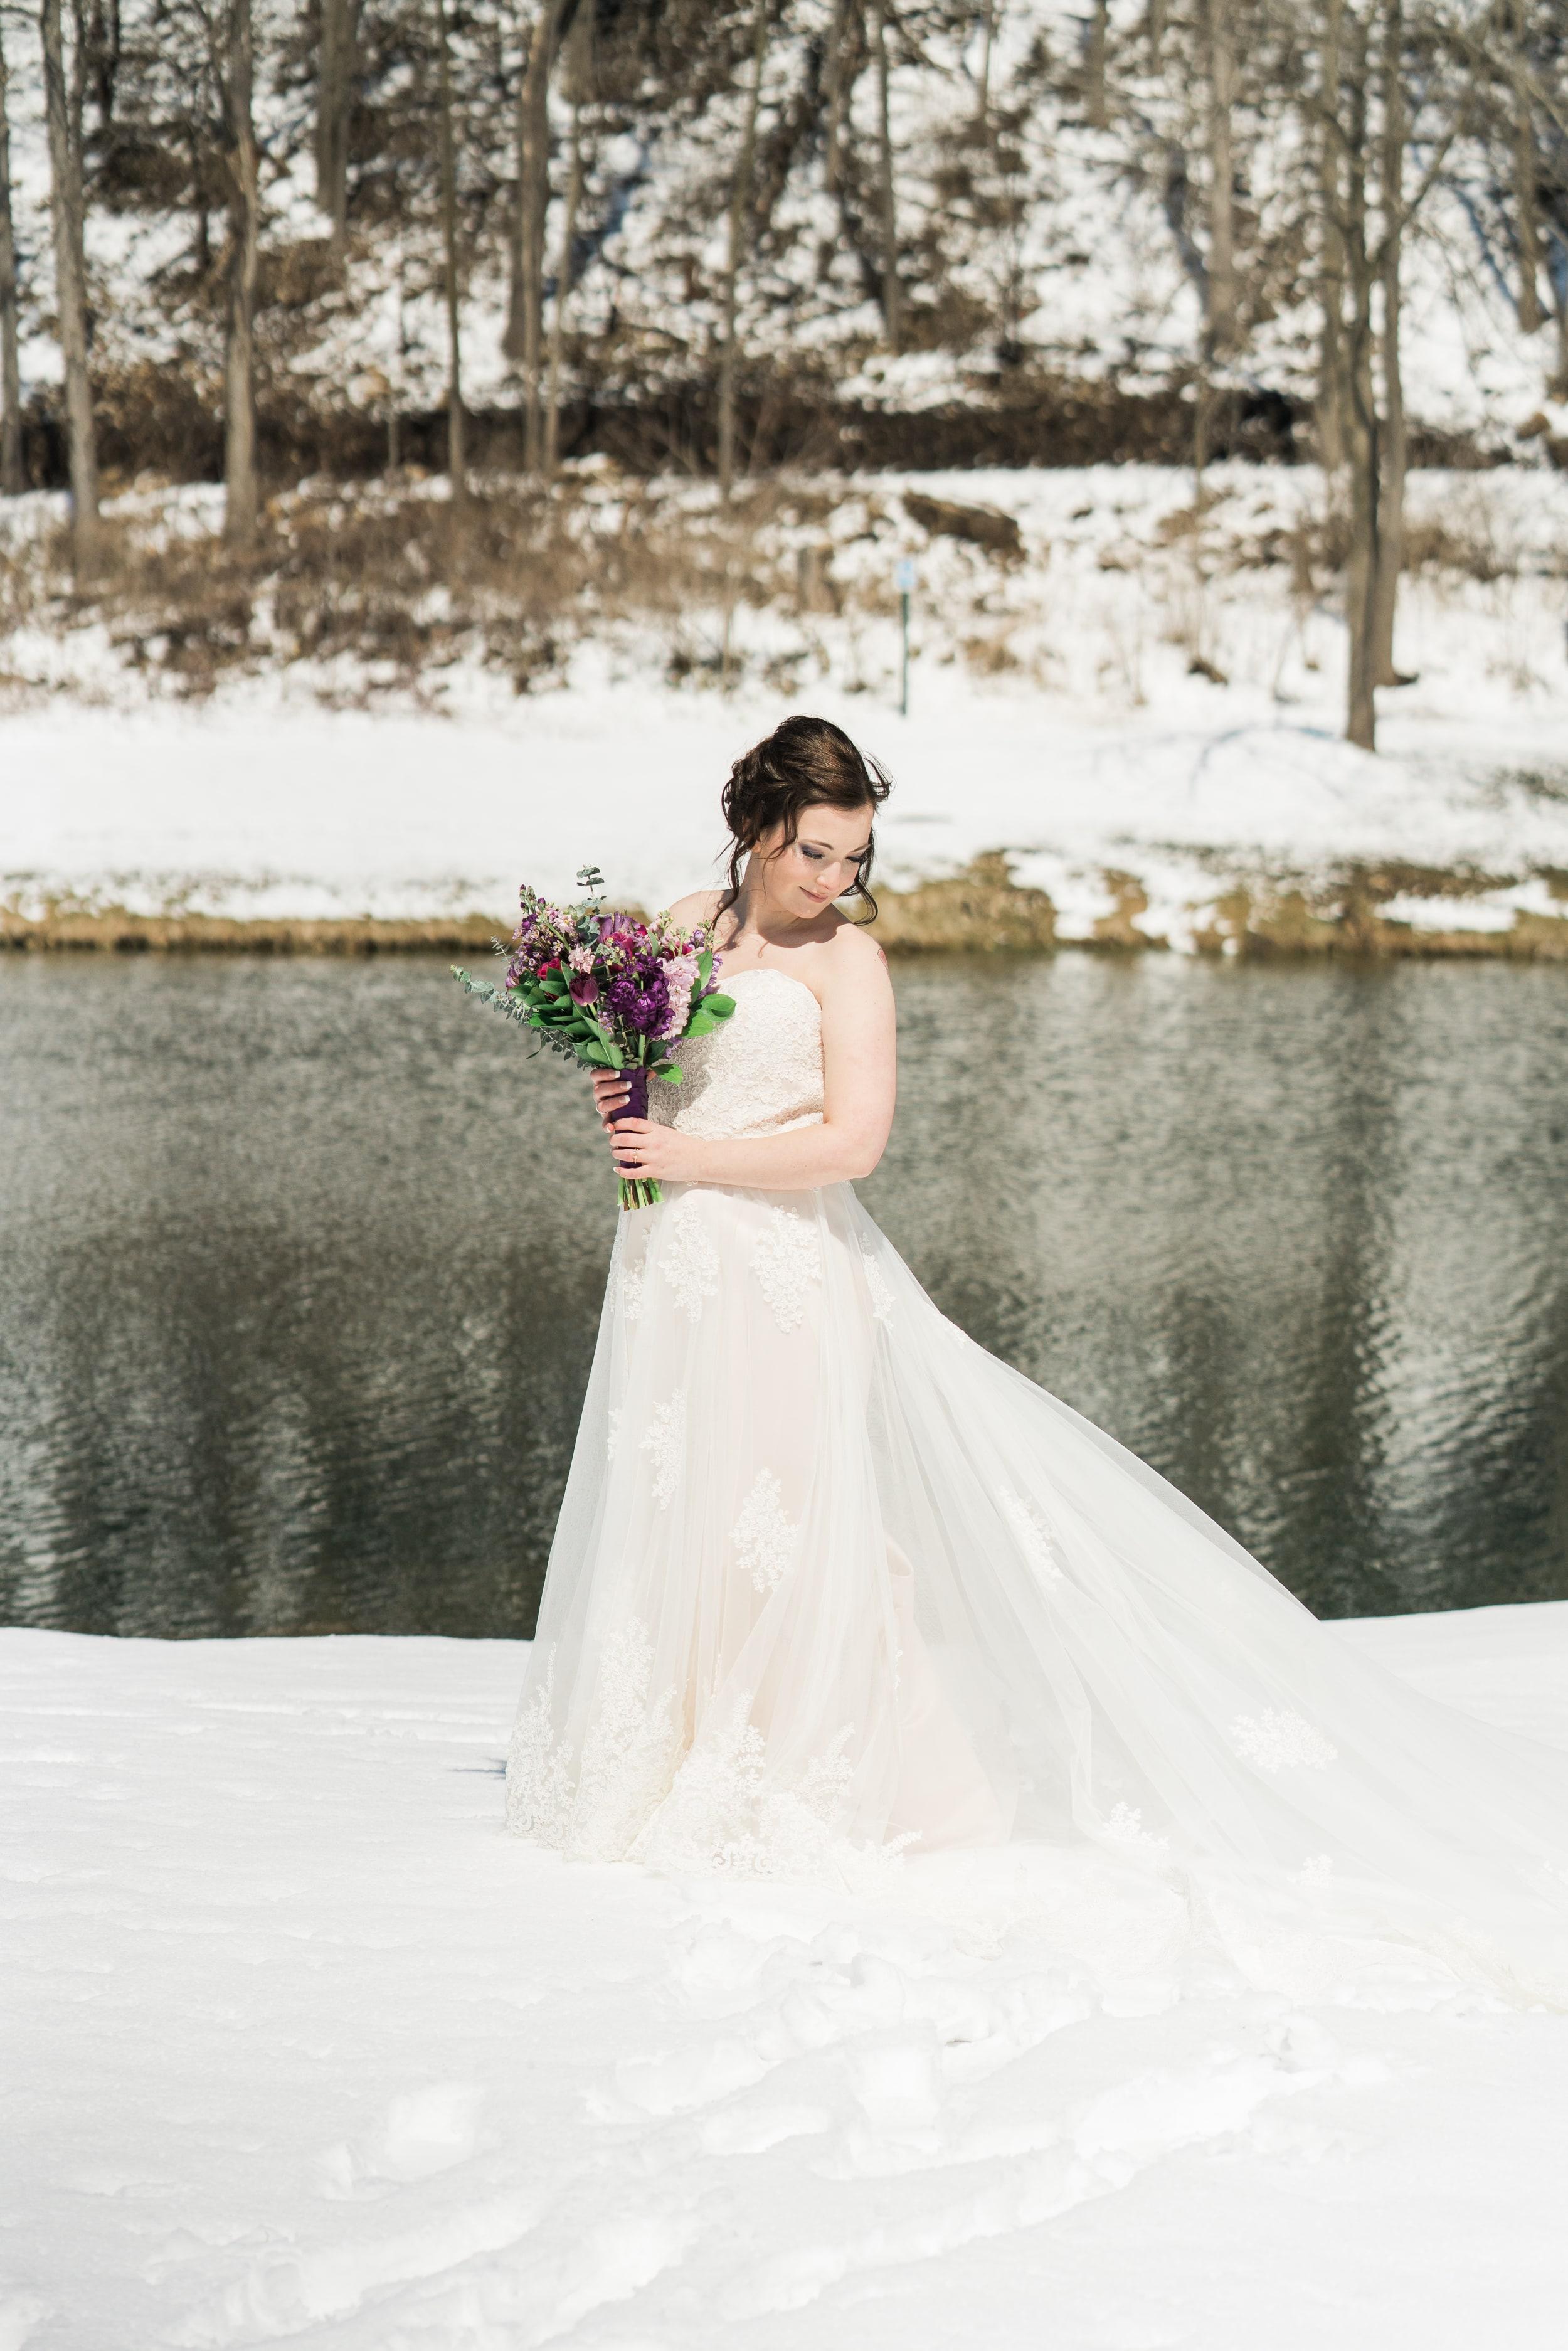 snowy-intimate-wedding-24.jpg